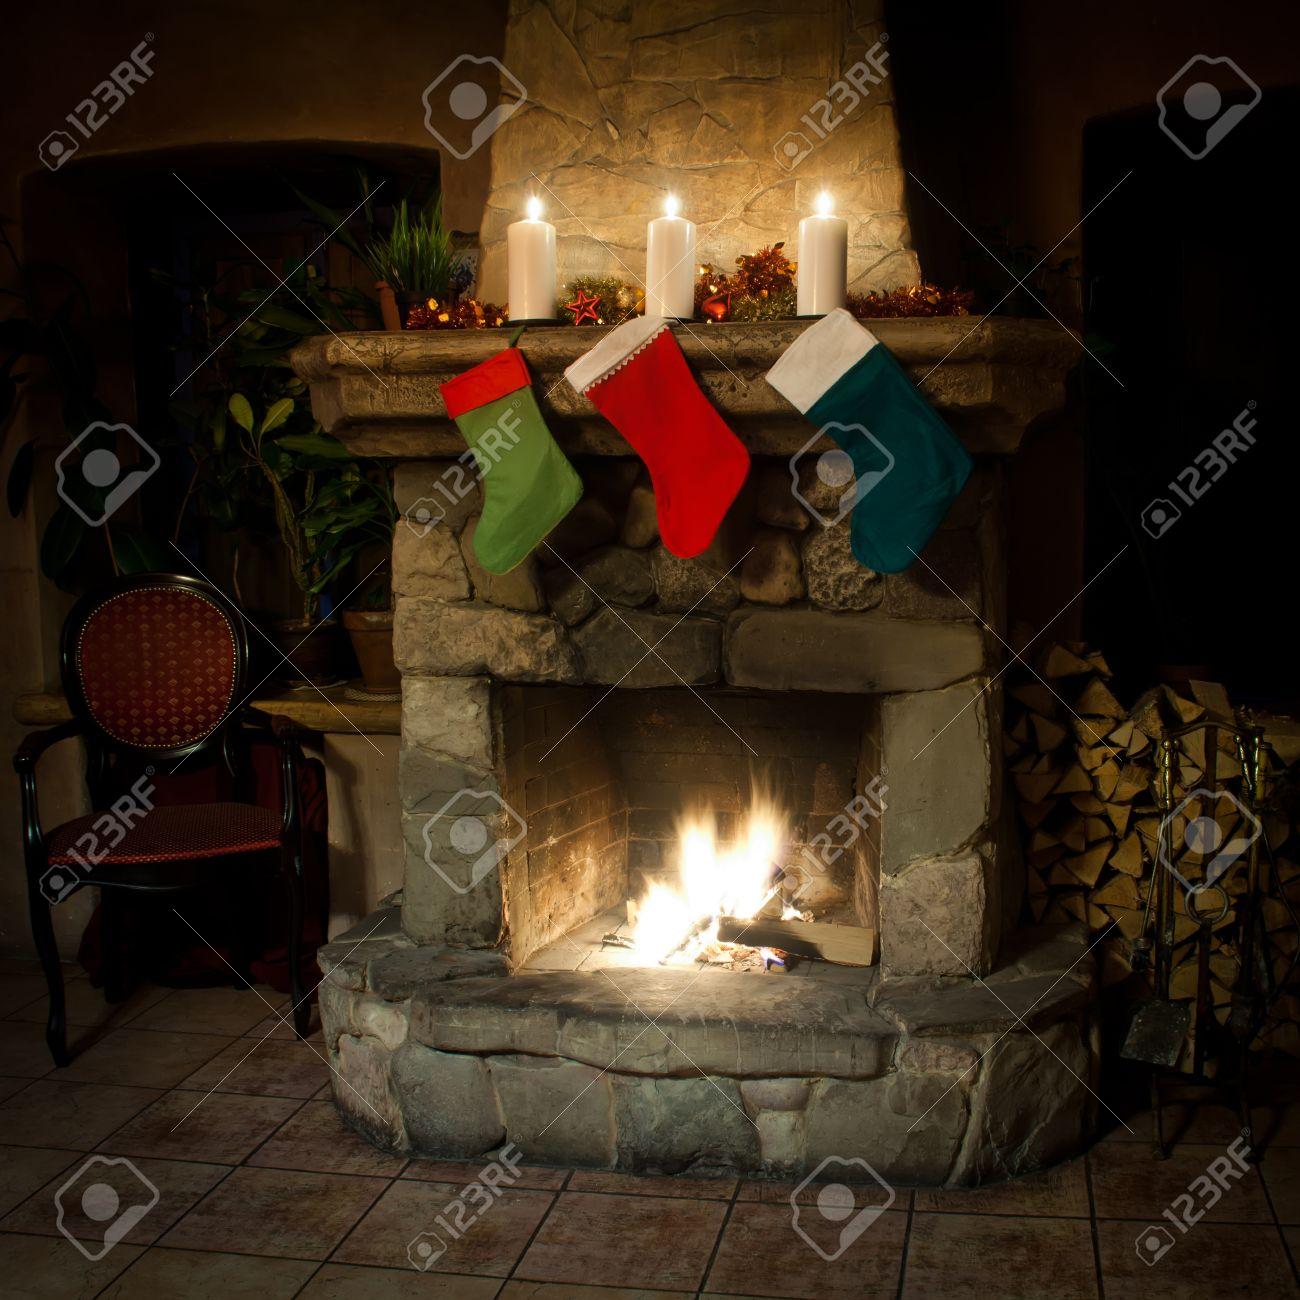 christmas stocking on fireplace background chimney candles stock